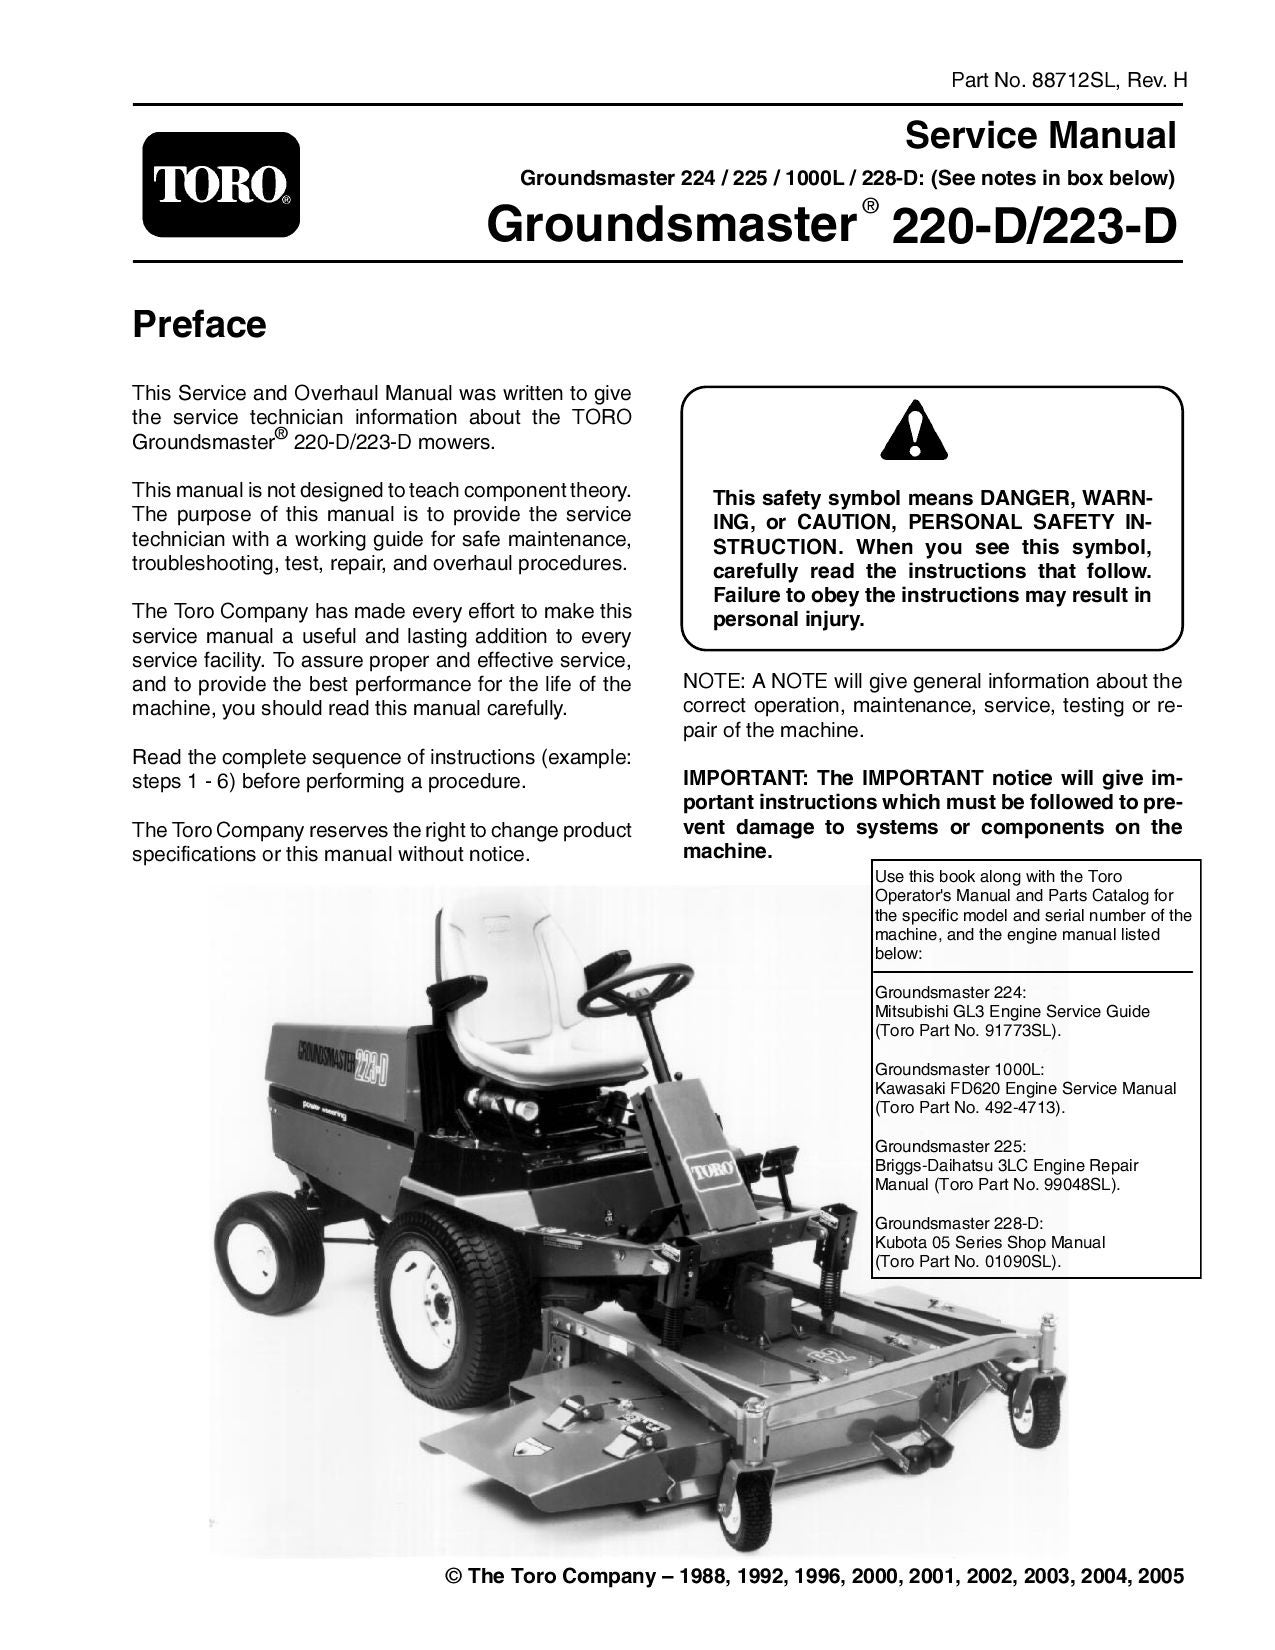 88712slpdf Groundsmaster 200 Series Rev H Nov 2005 By Negimachi Kawasaki Fd620 Wiring Diagram Issuu